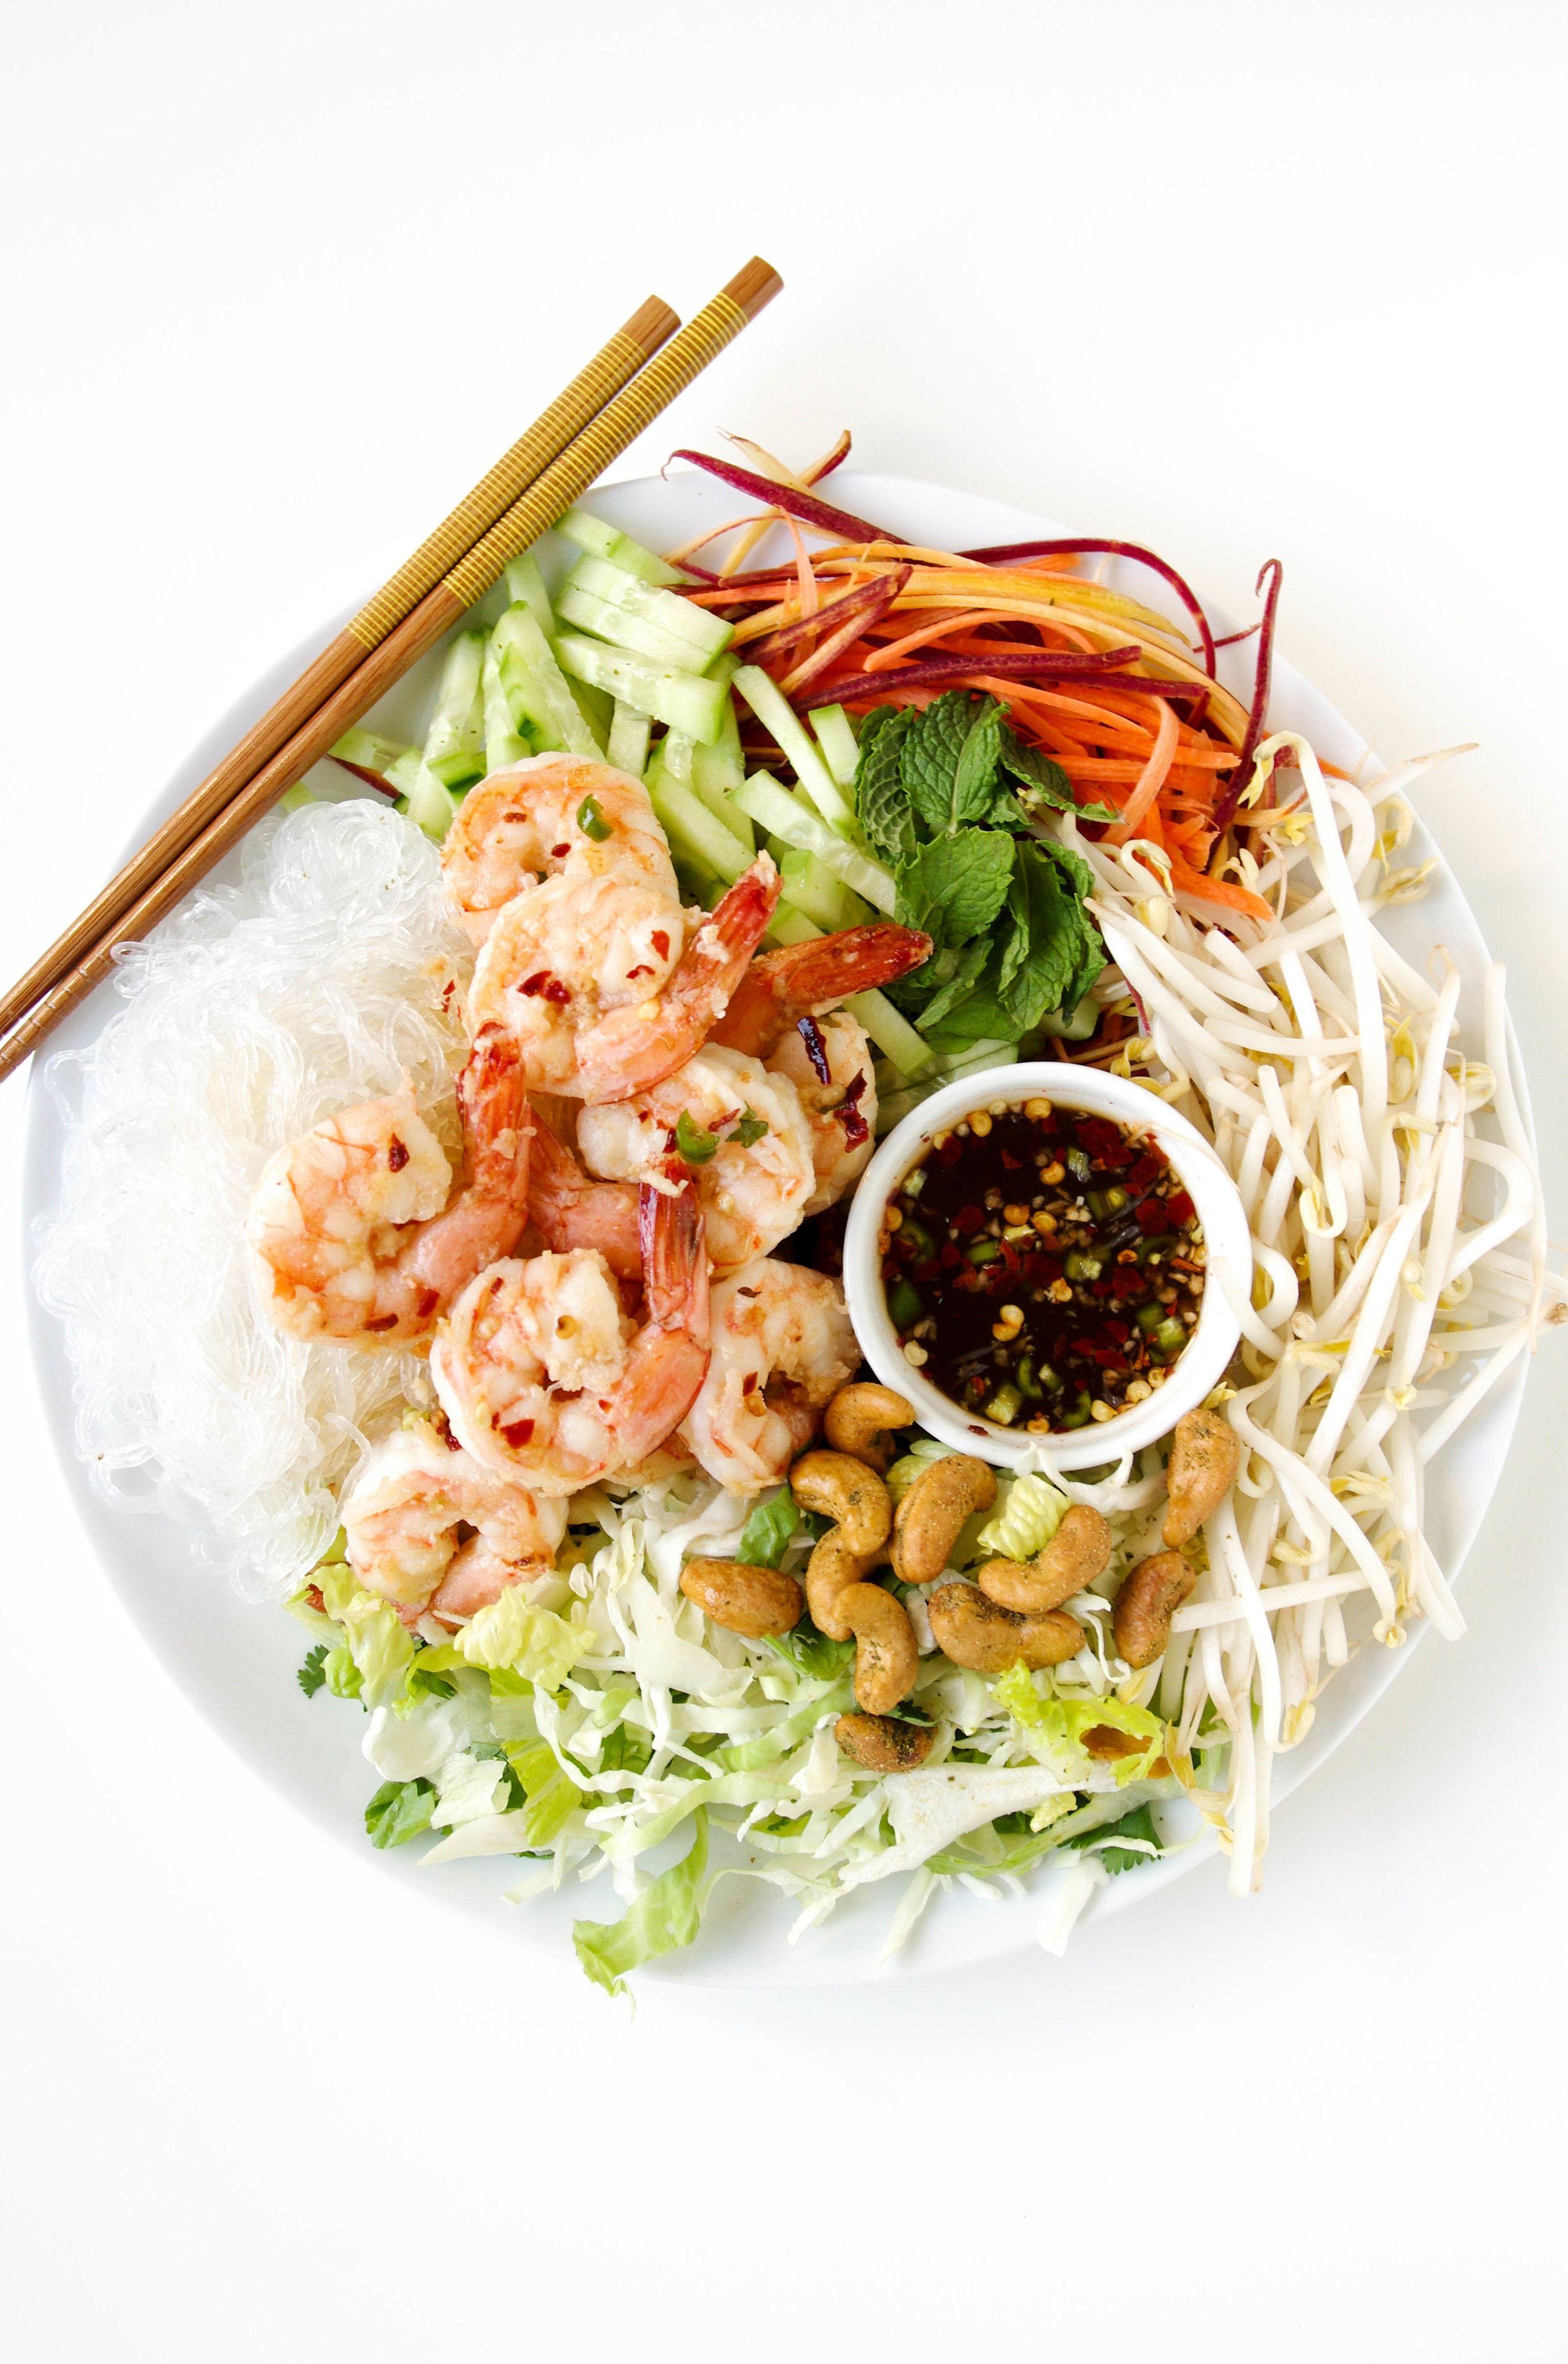 Cold Vietnamese Garlic Prawn Noodle Salad   Perfect for hot summer nights